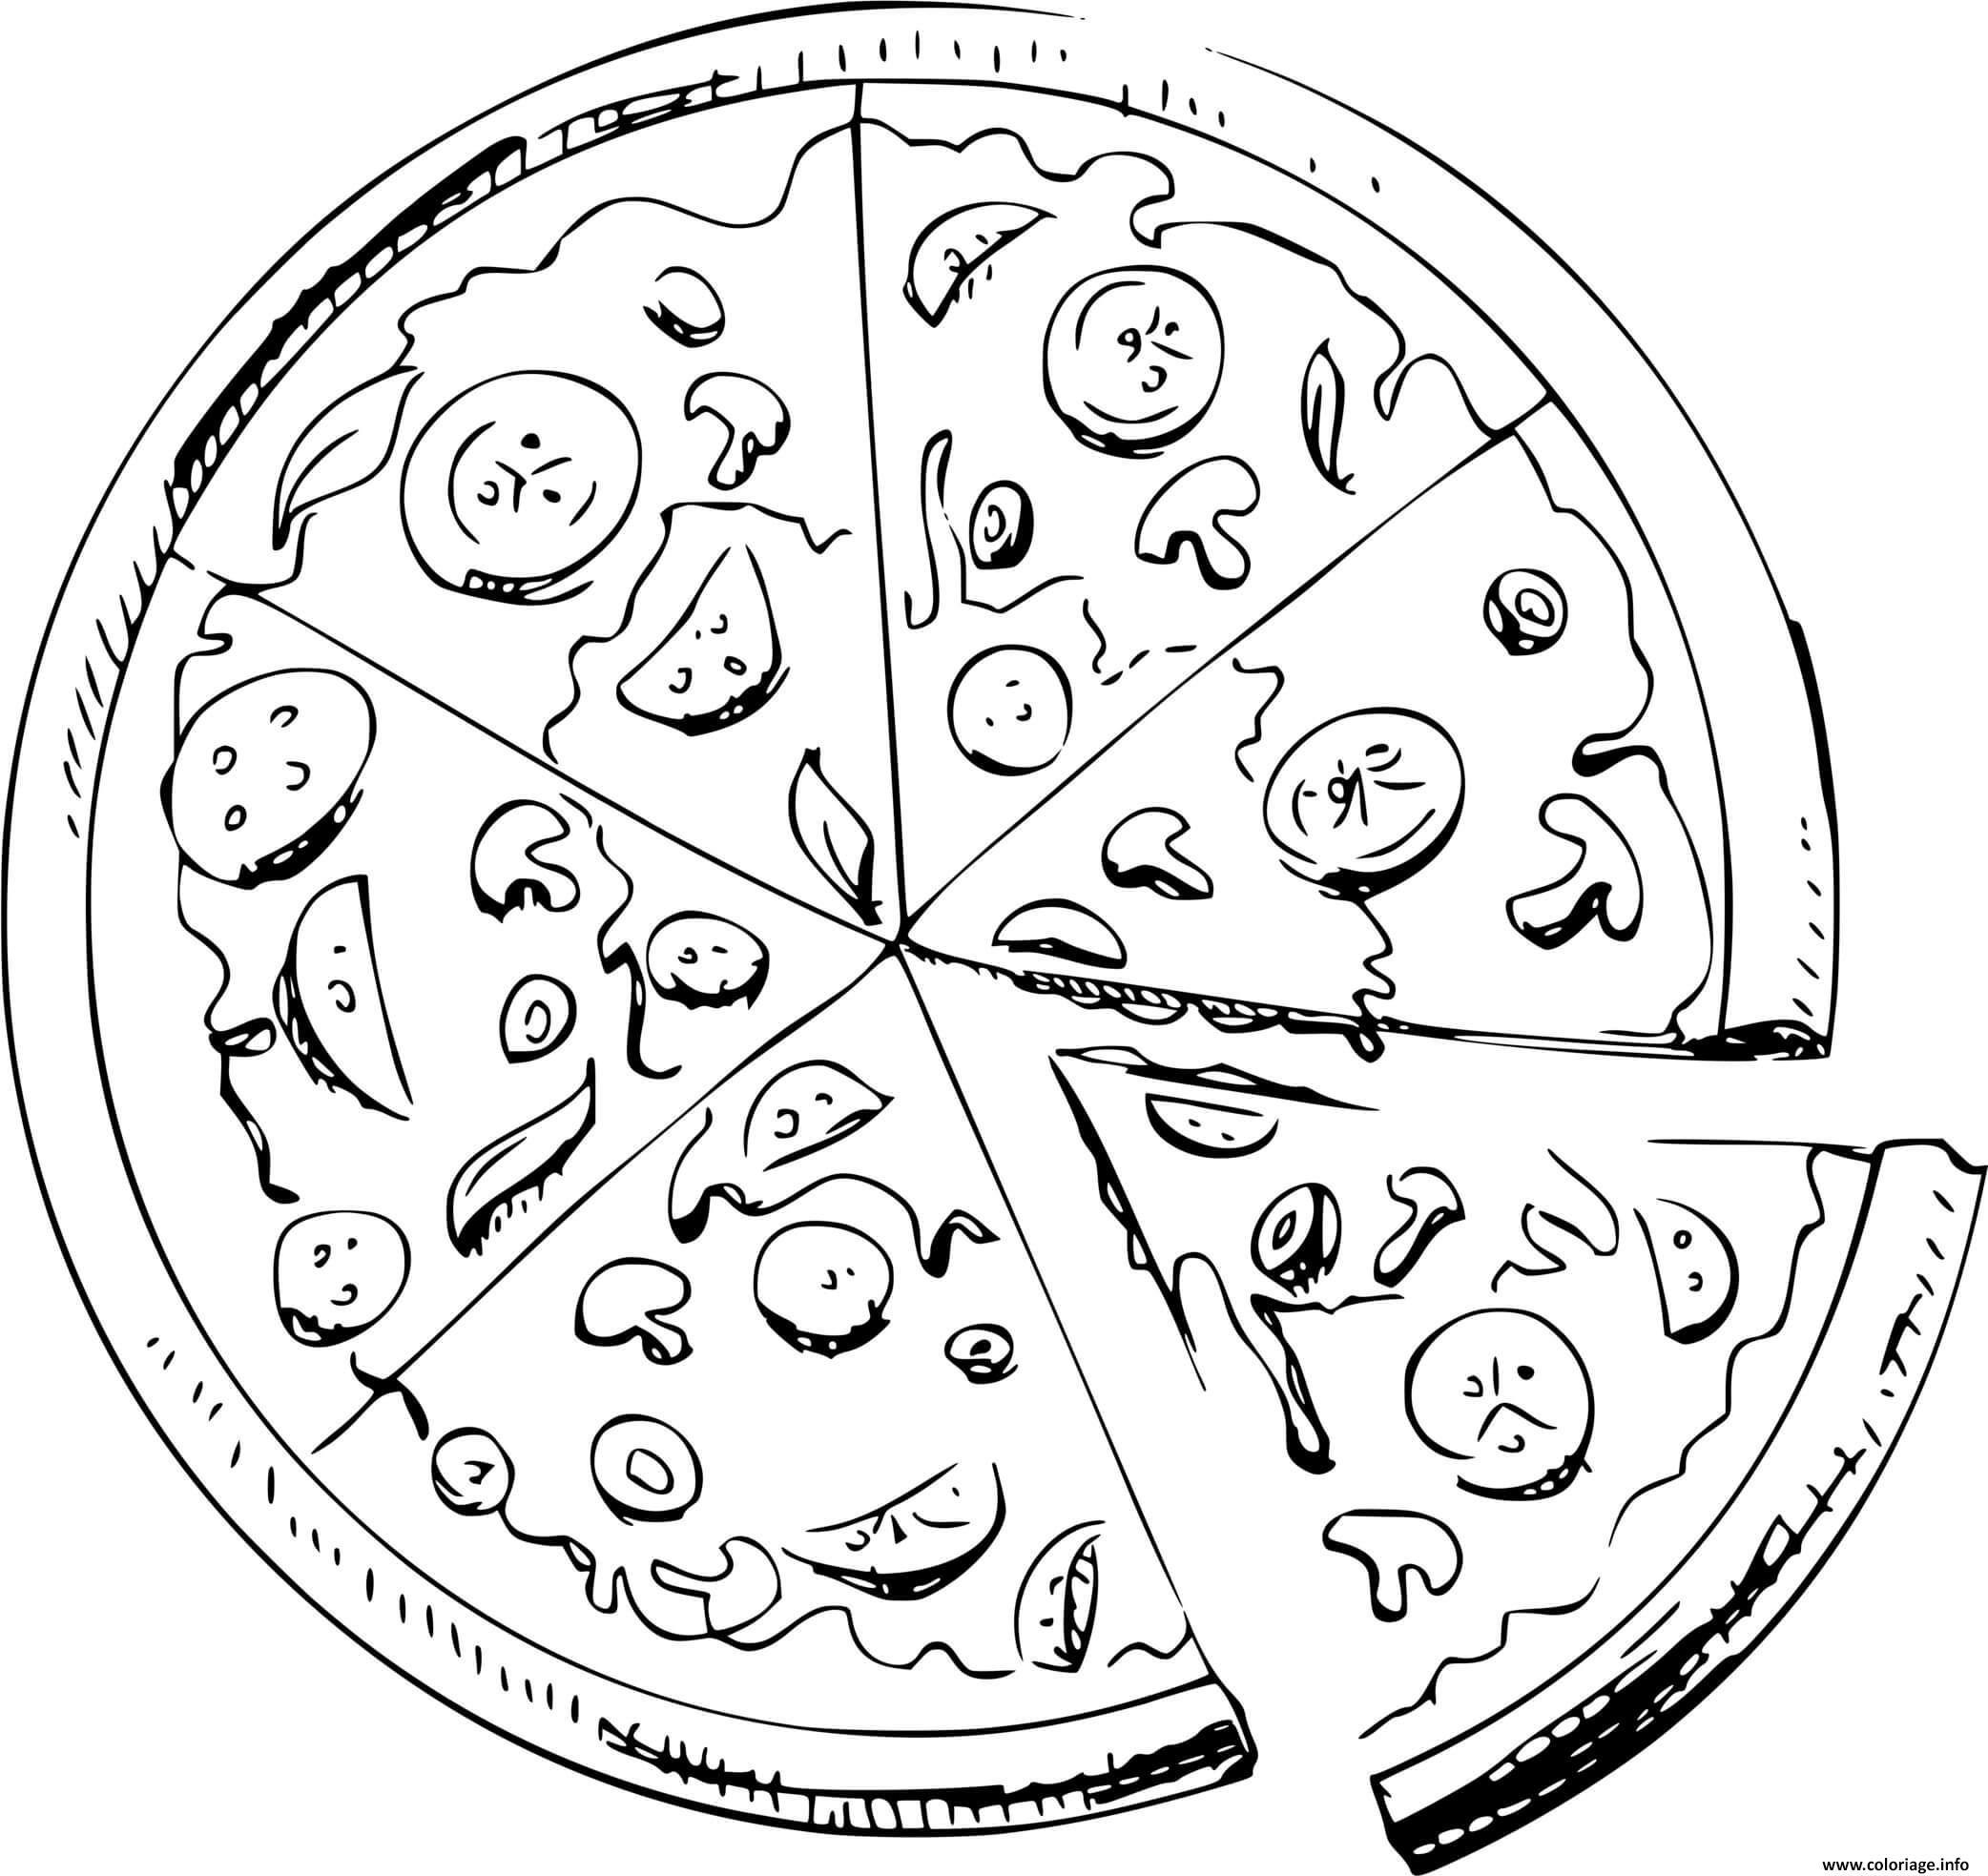 Dessin pizza reine regina tomate mozzarella jambon champignons Coloriage Gratuit à Imprimer